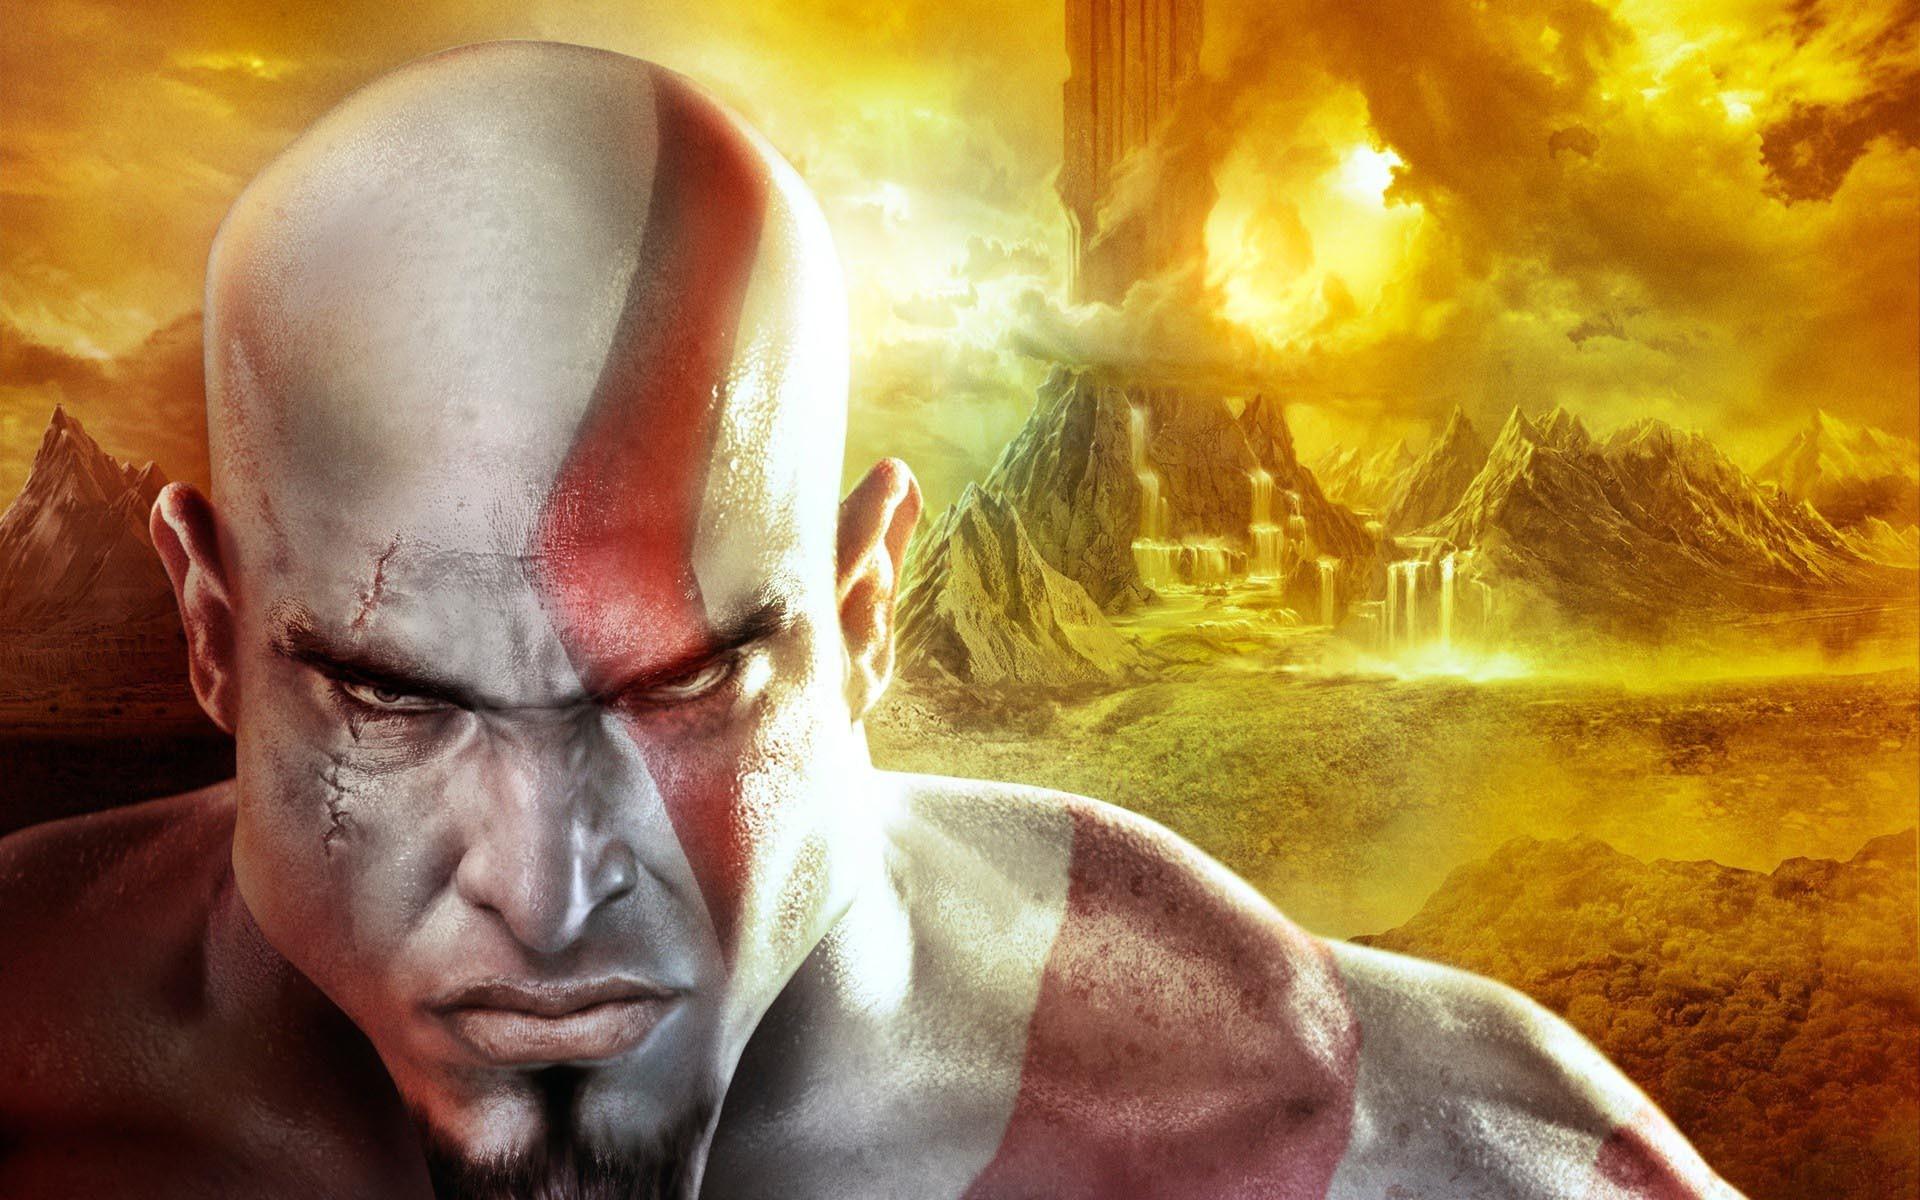 Zeus Wallpaper God Of War HD Images New 1920×1200 Kratos God Of War  Wallpapers